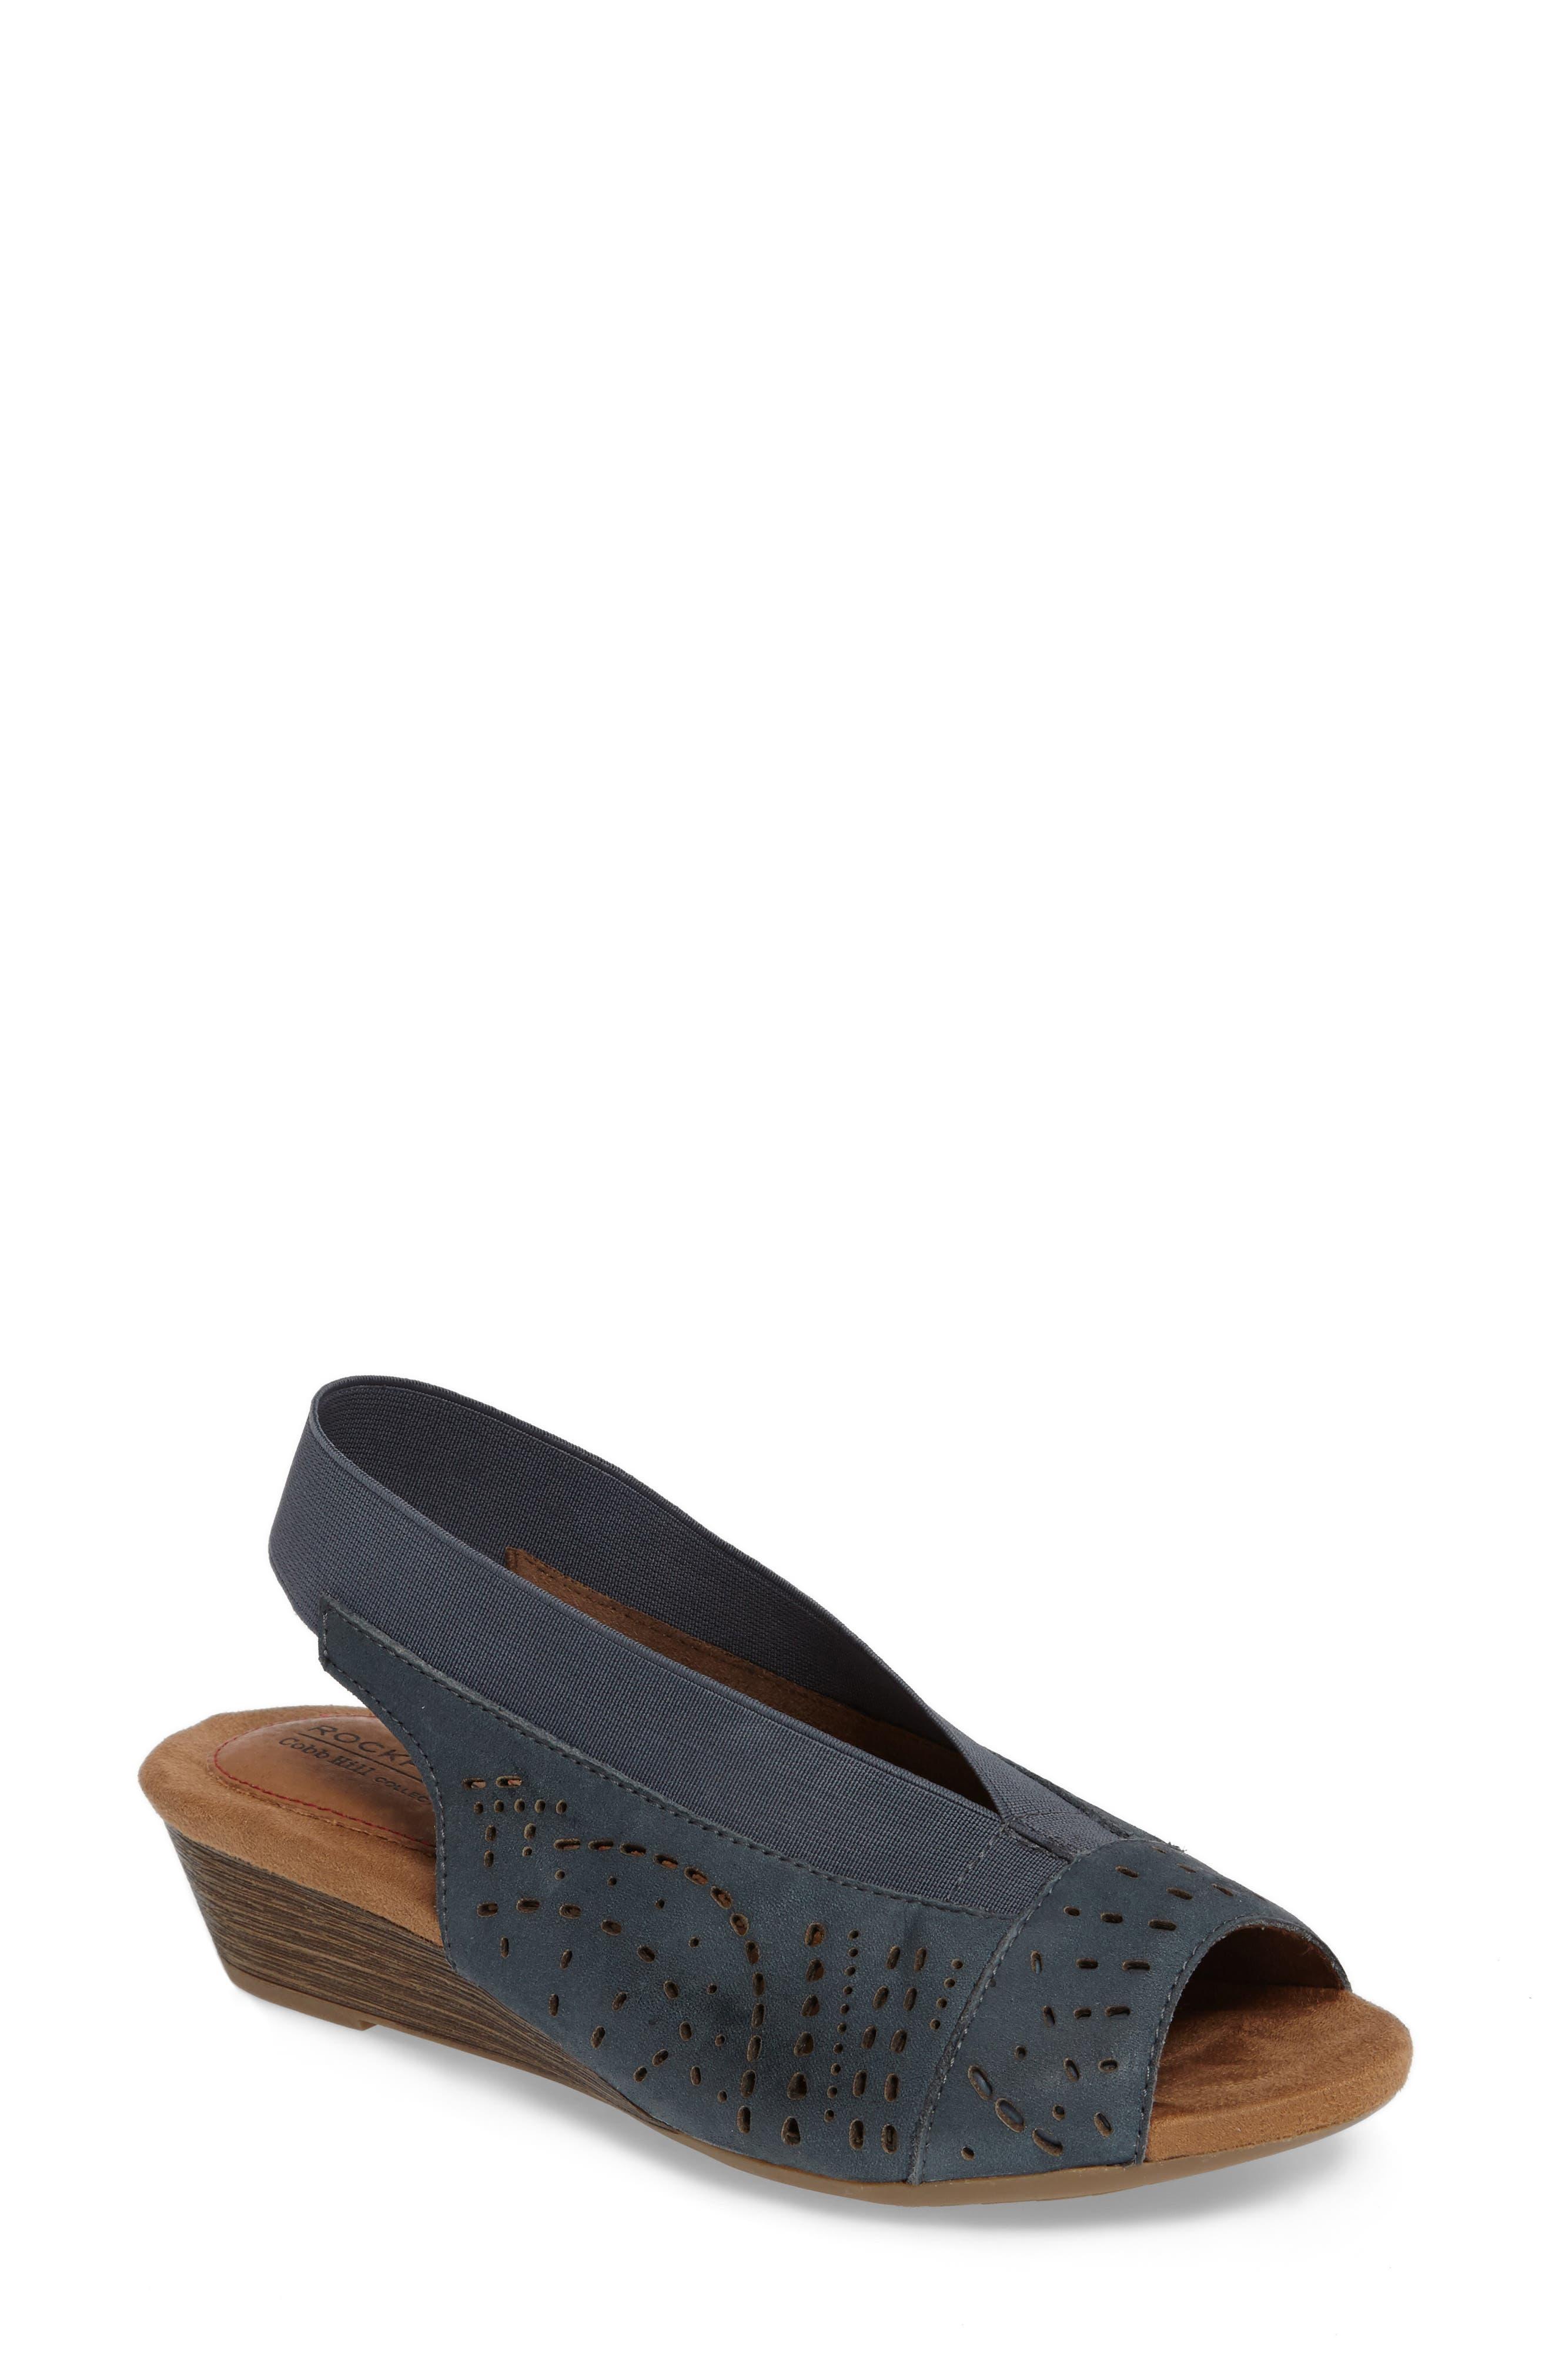 Rockport Cobb Hill Judson Slingback Wedge Sandal (Women)